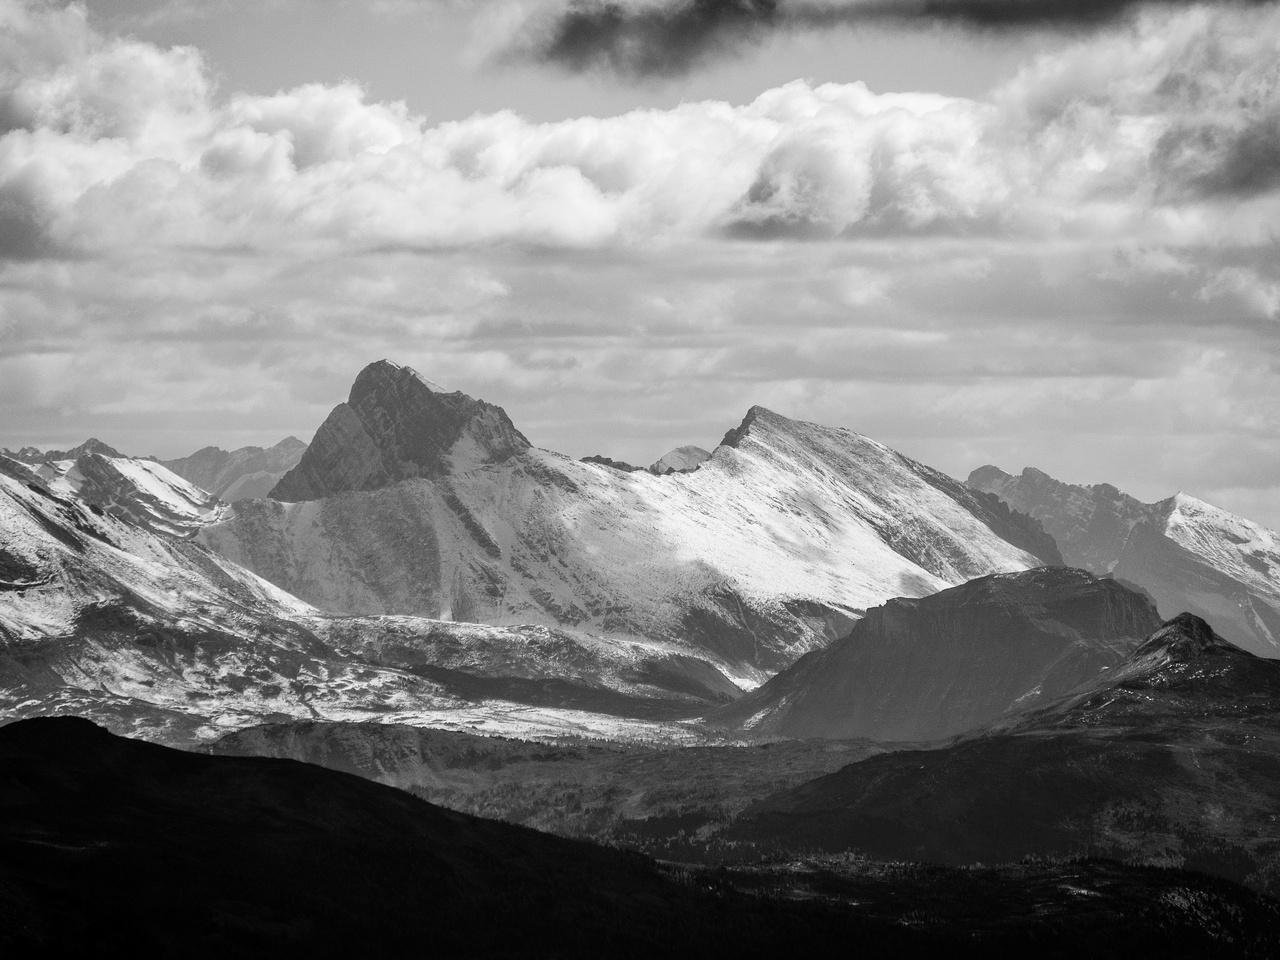 Golden, Naswald and Citadel peaks.